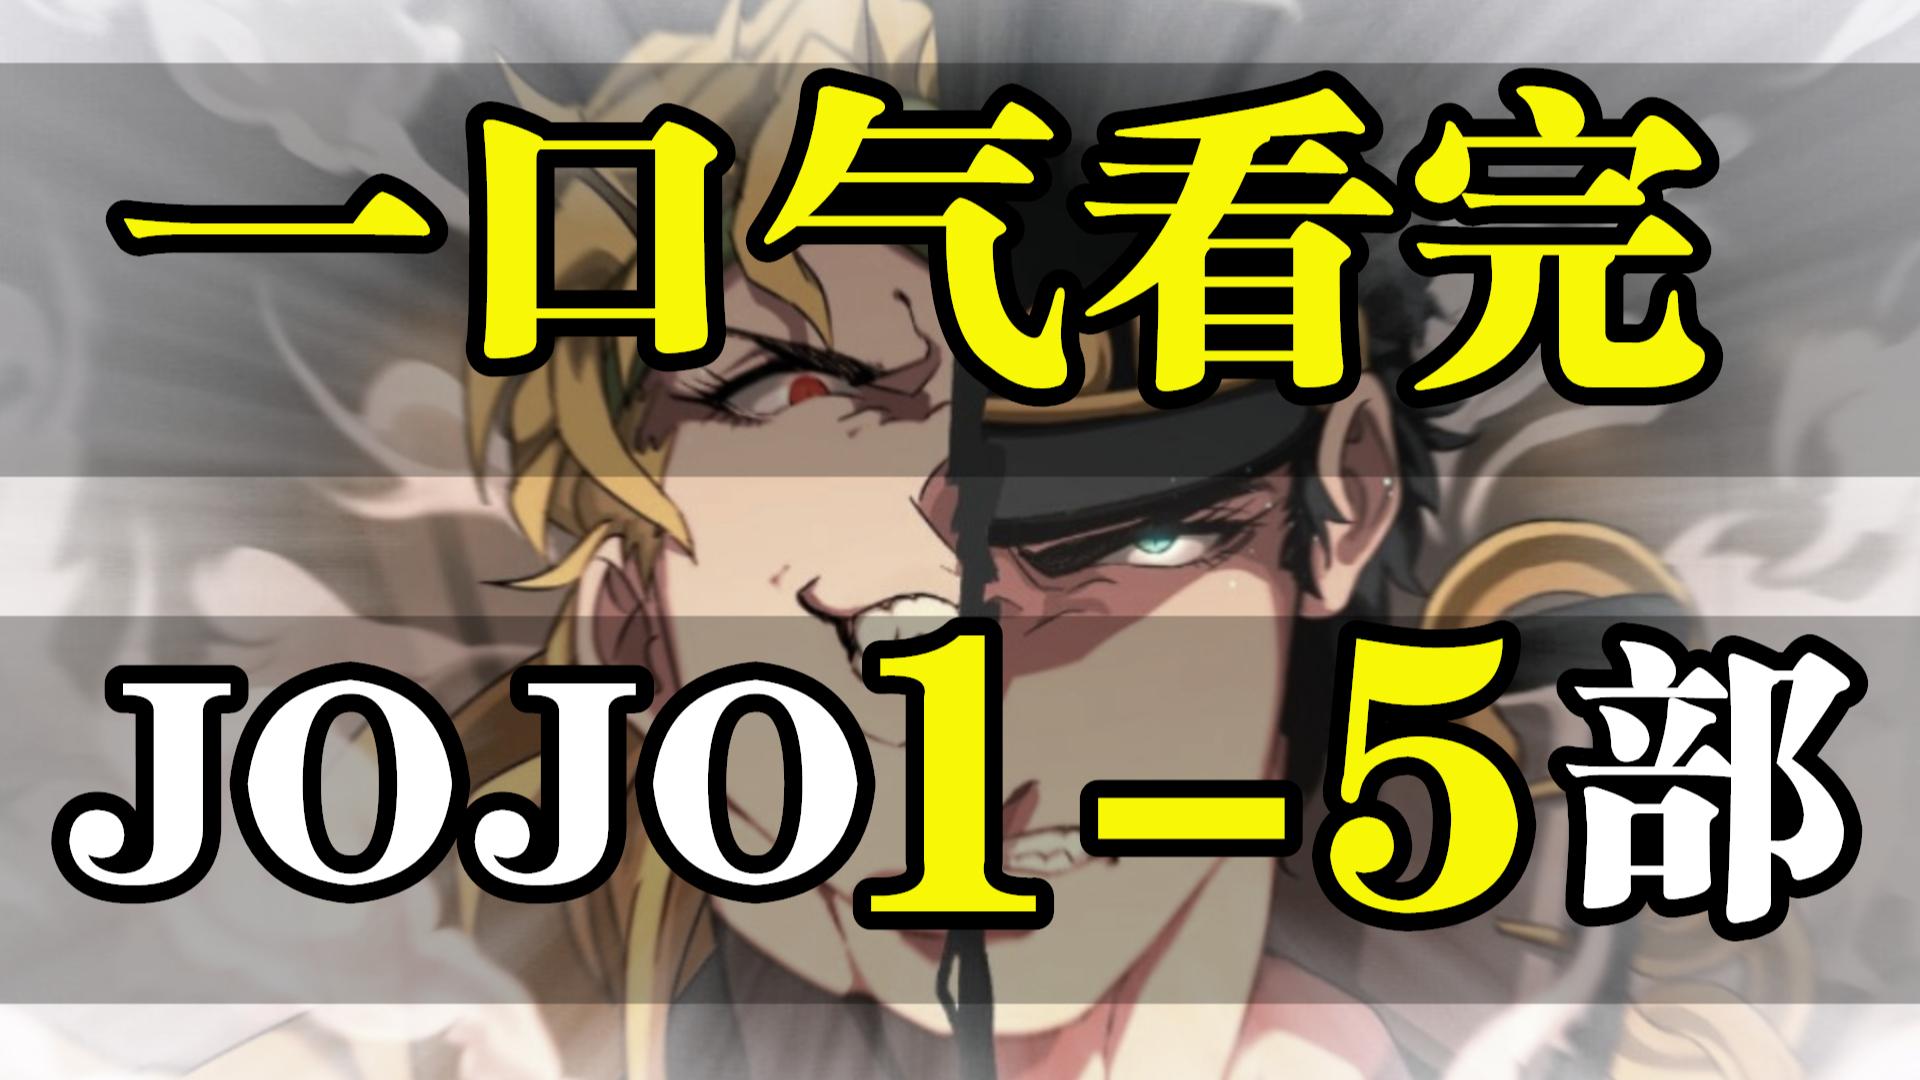 【JOJO】1-5部剧情解说!全网梗最多的作品!